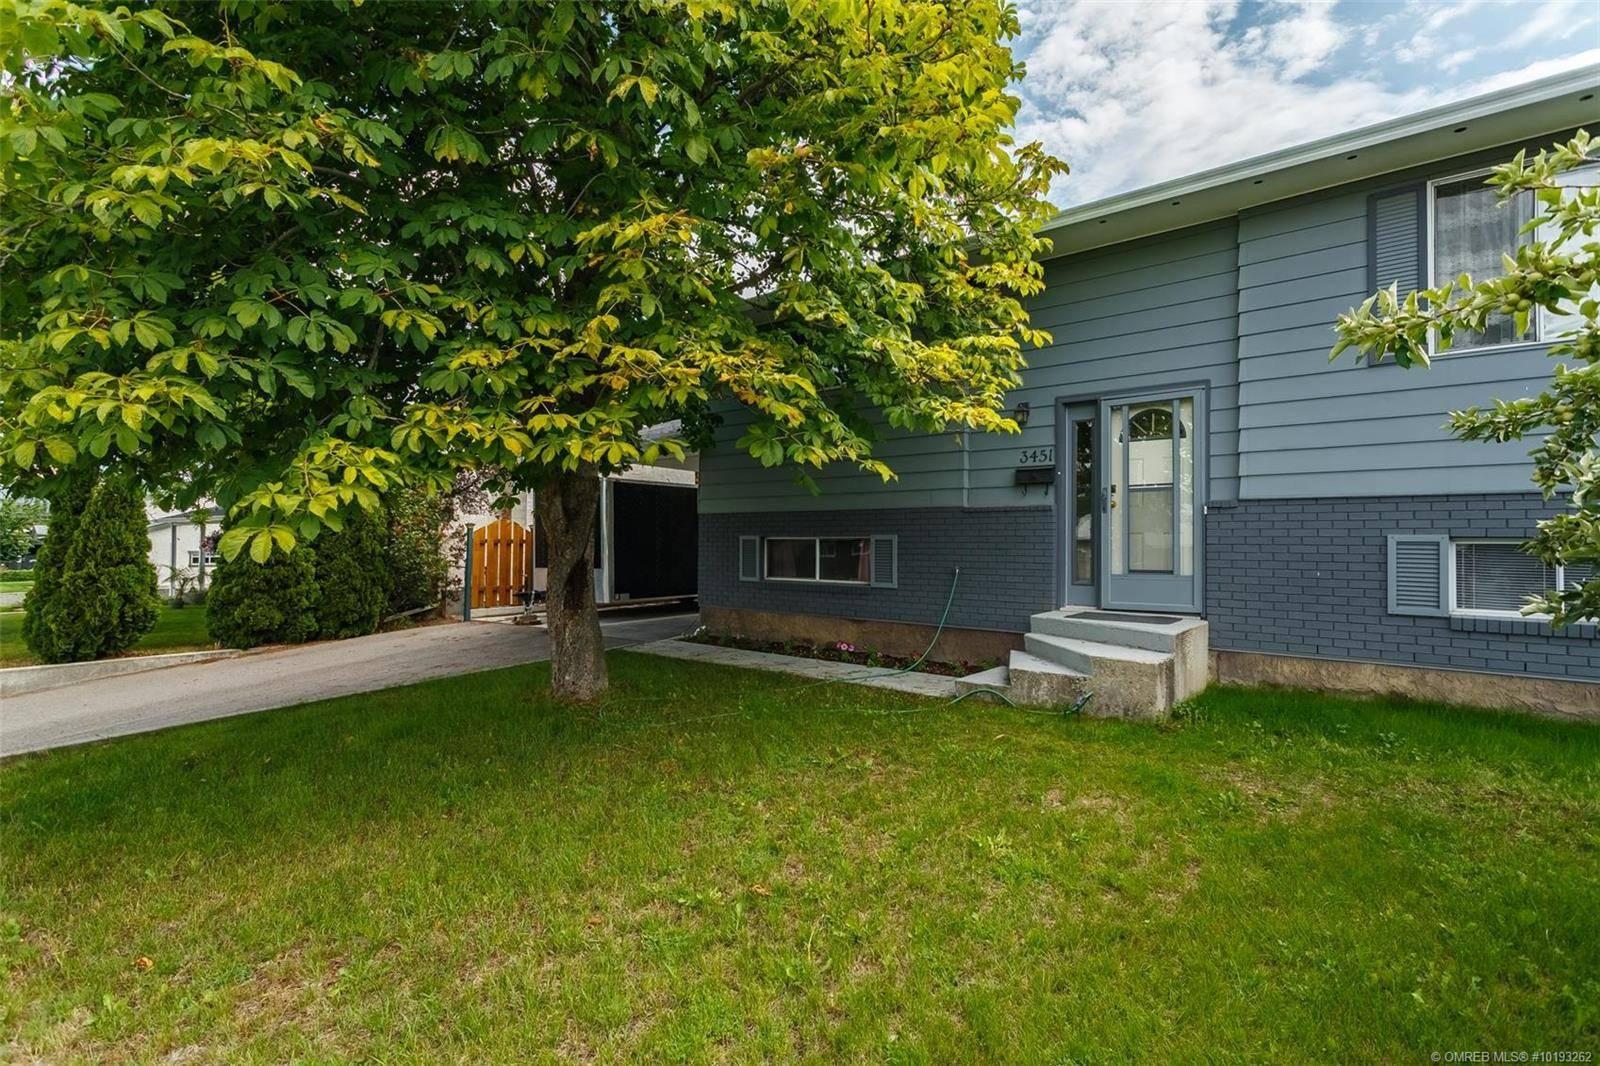 House for sale at 3451 Seratoga Rd Kelowna British Columbia - MLS: 10193262